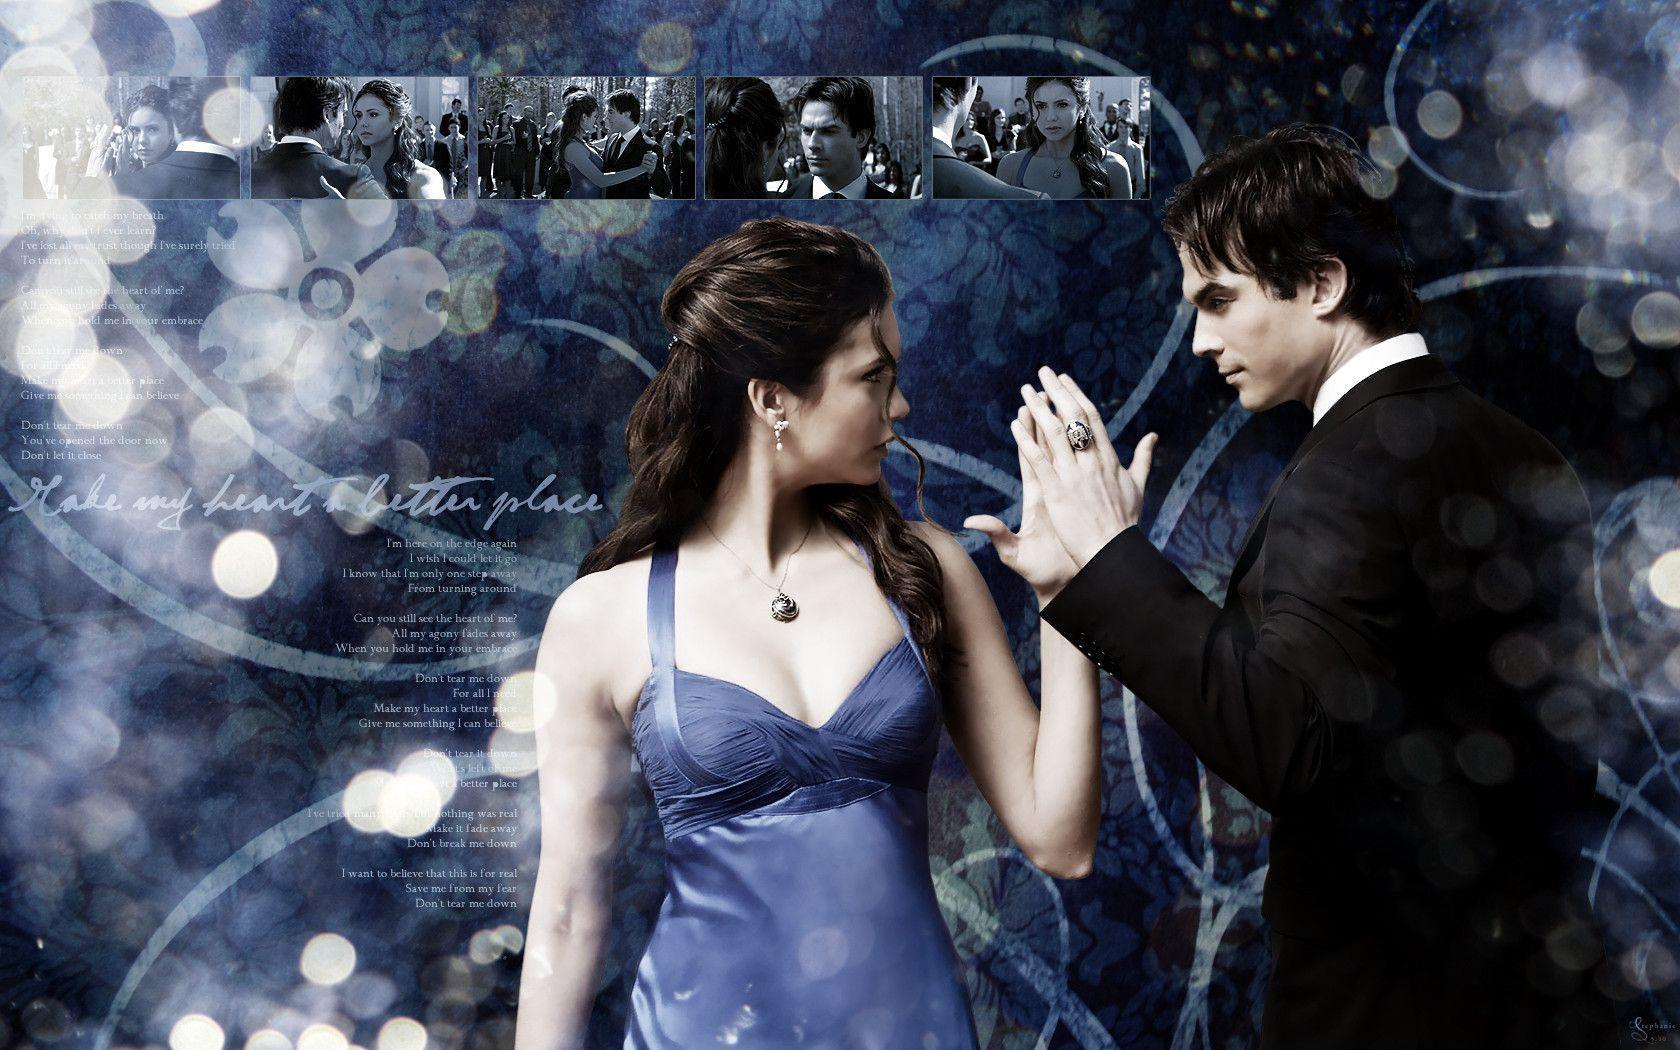 The Vampire Diaries Wallpapers Damon - Wallpaper Cave